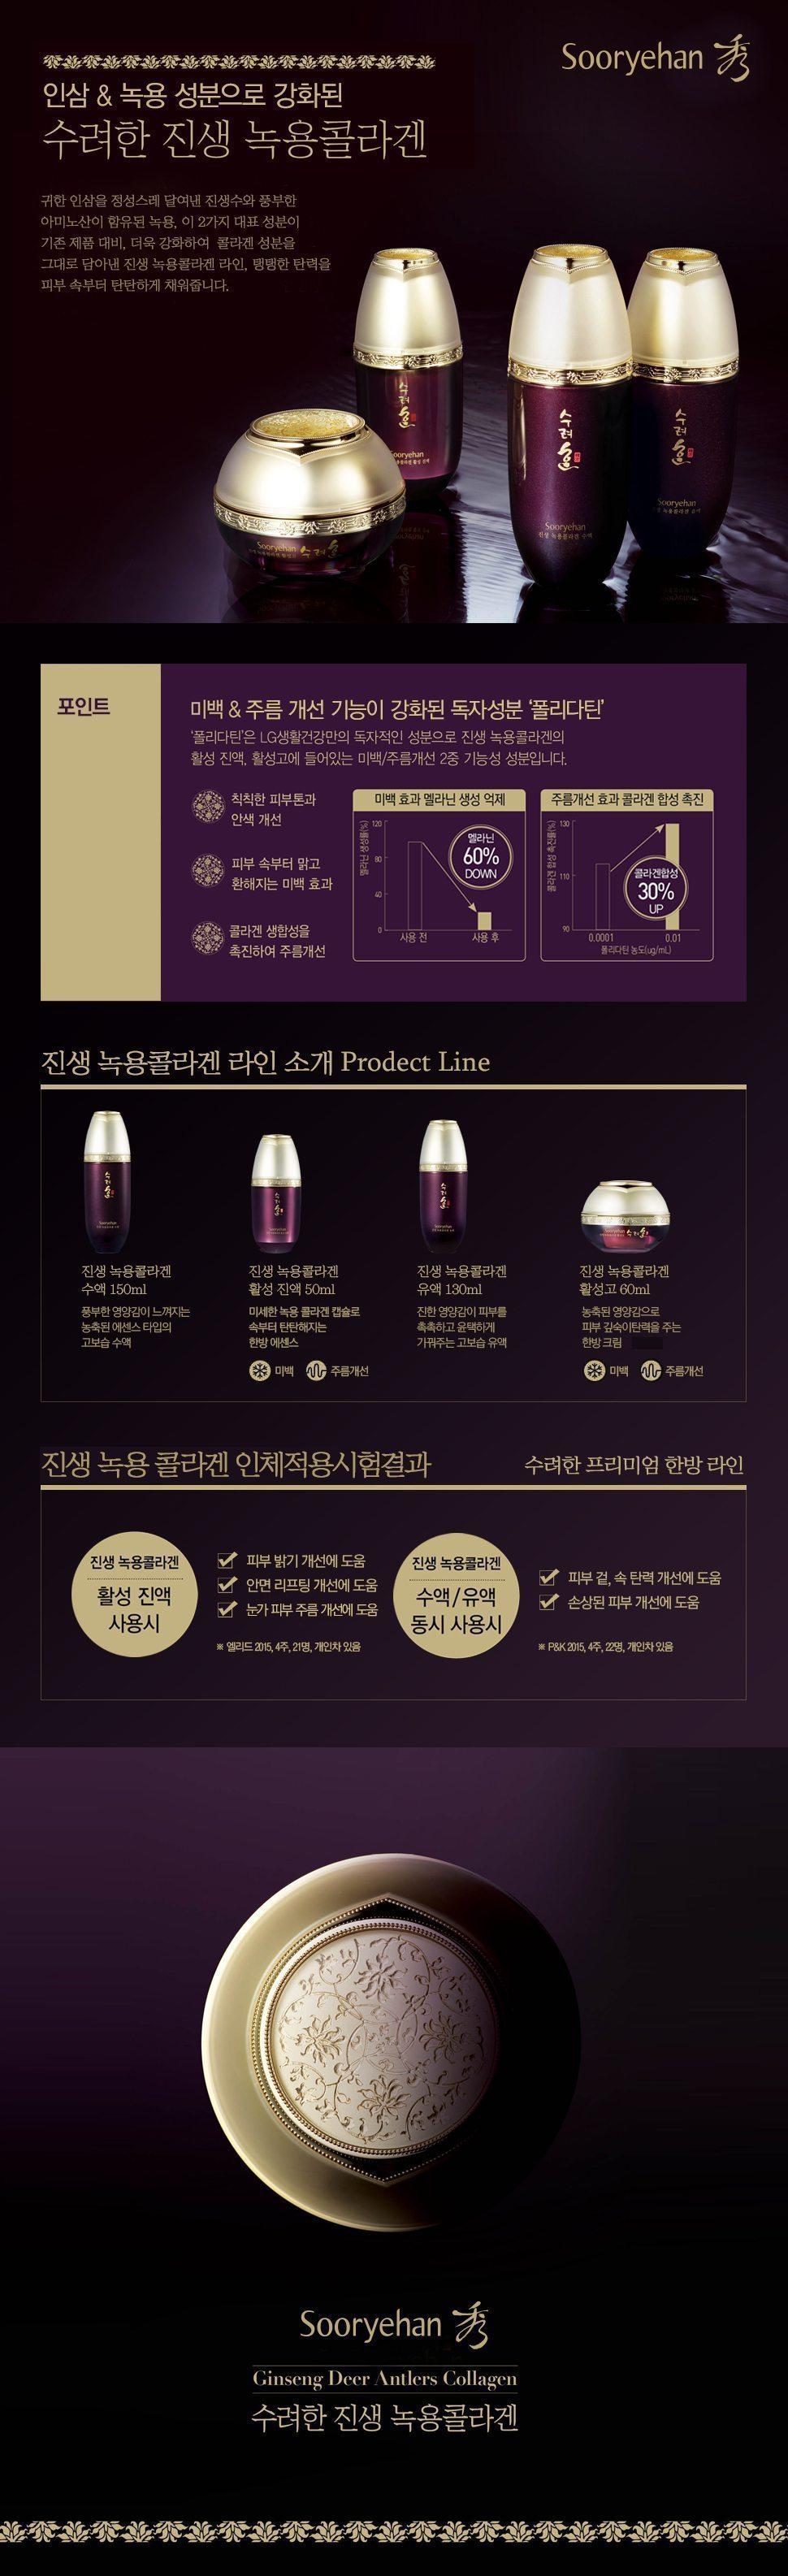 Sooryehan Ginseng Nok Yong Collagen Cream 60ml malaysia singapore indonesia